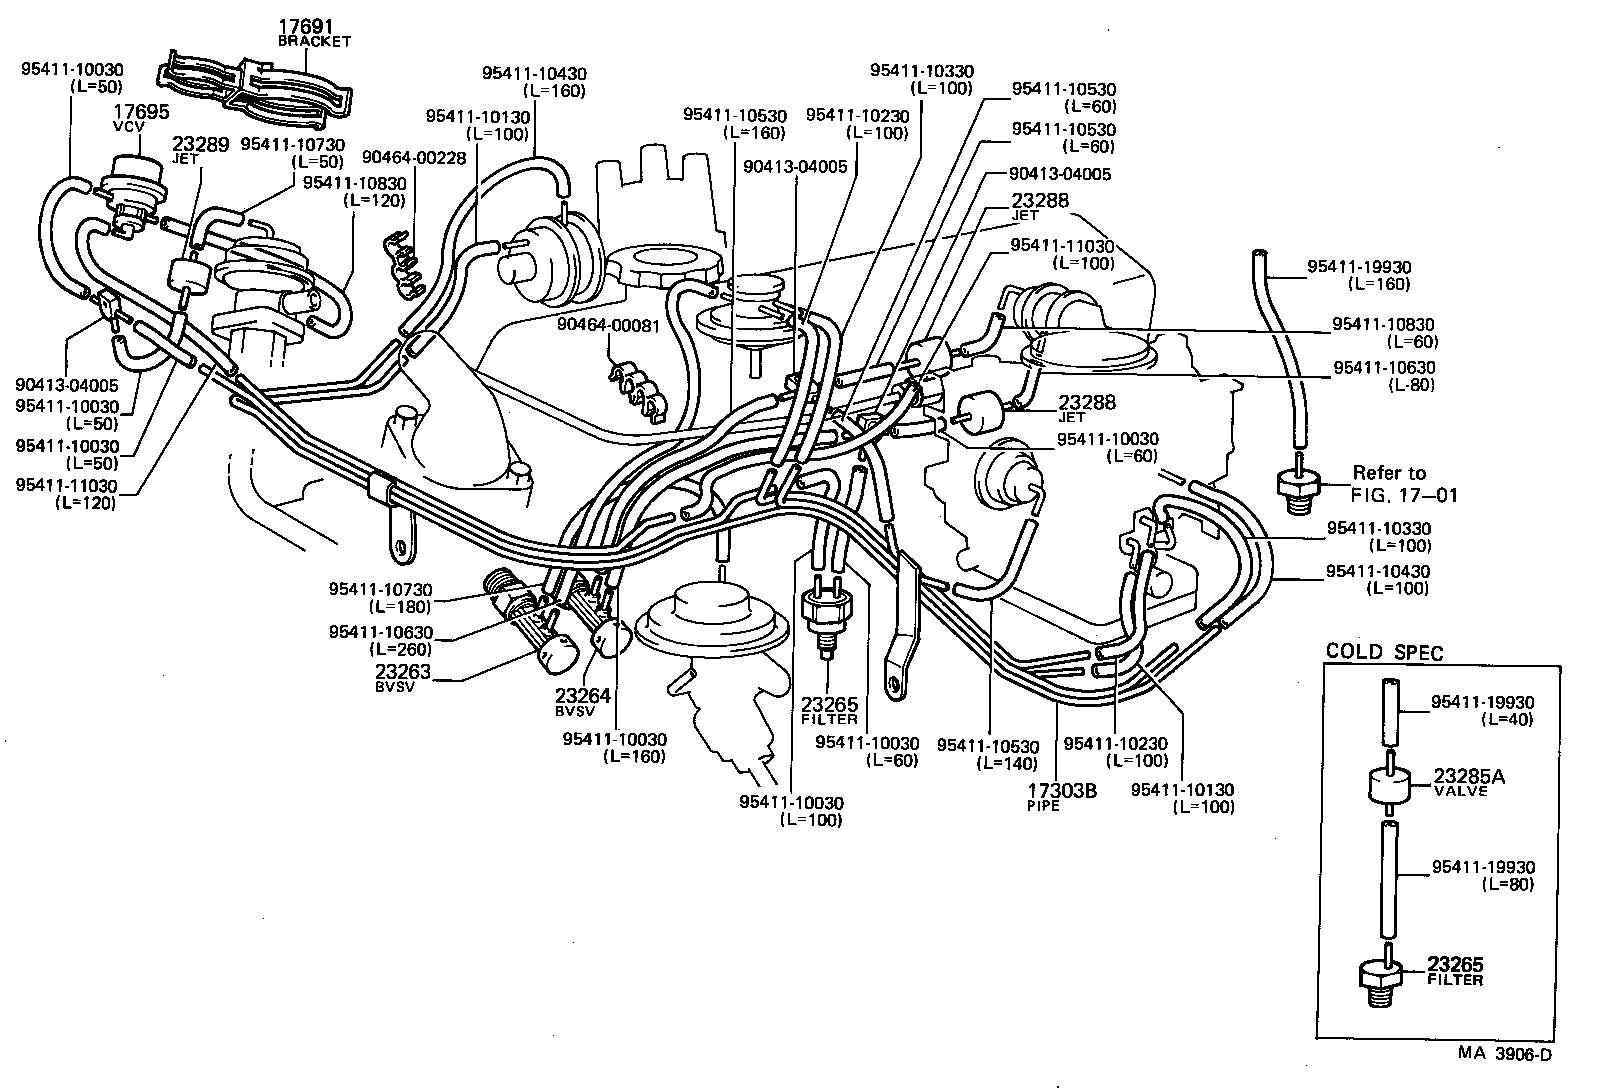 Toyota Starletkp61 Phmss